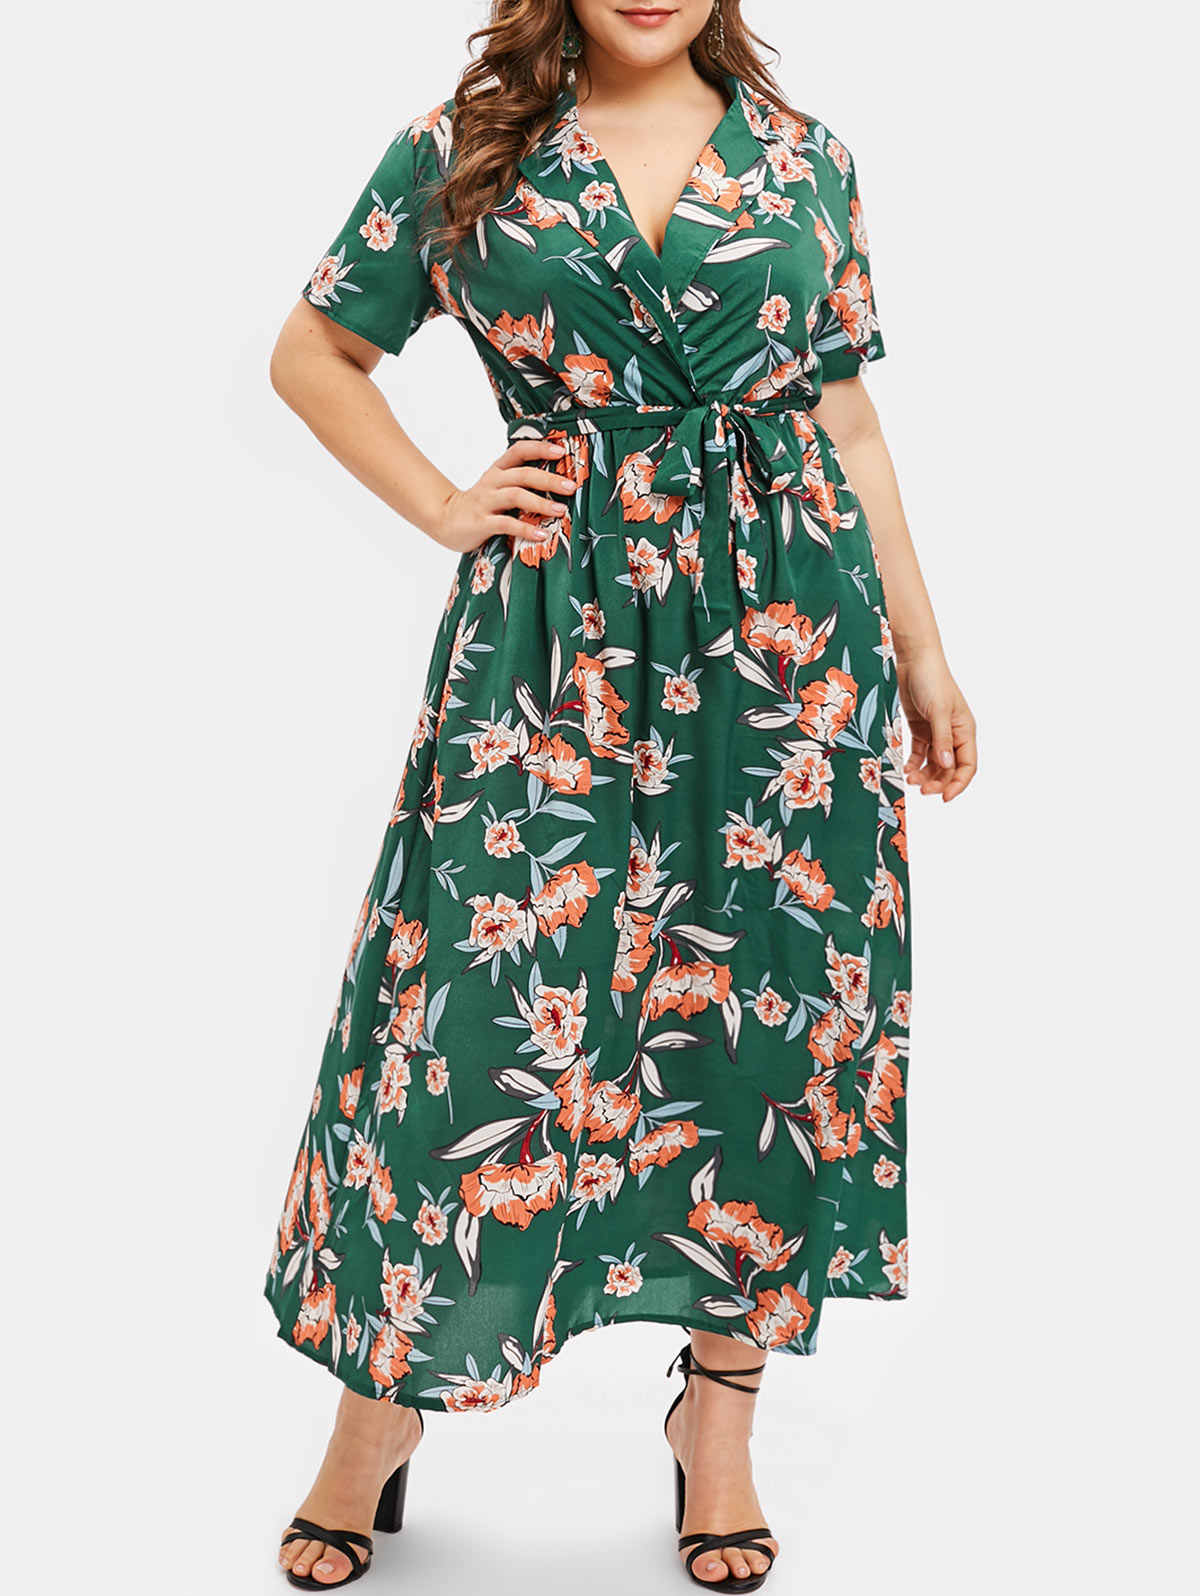 Wipalo Plus Size Floral Print Long Dress Women Spring Summer Beach Boho Dress  Casual A- 4021b4eb6